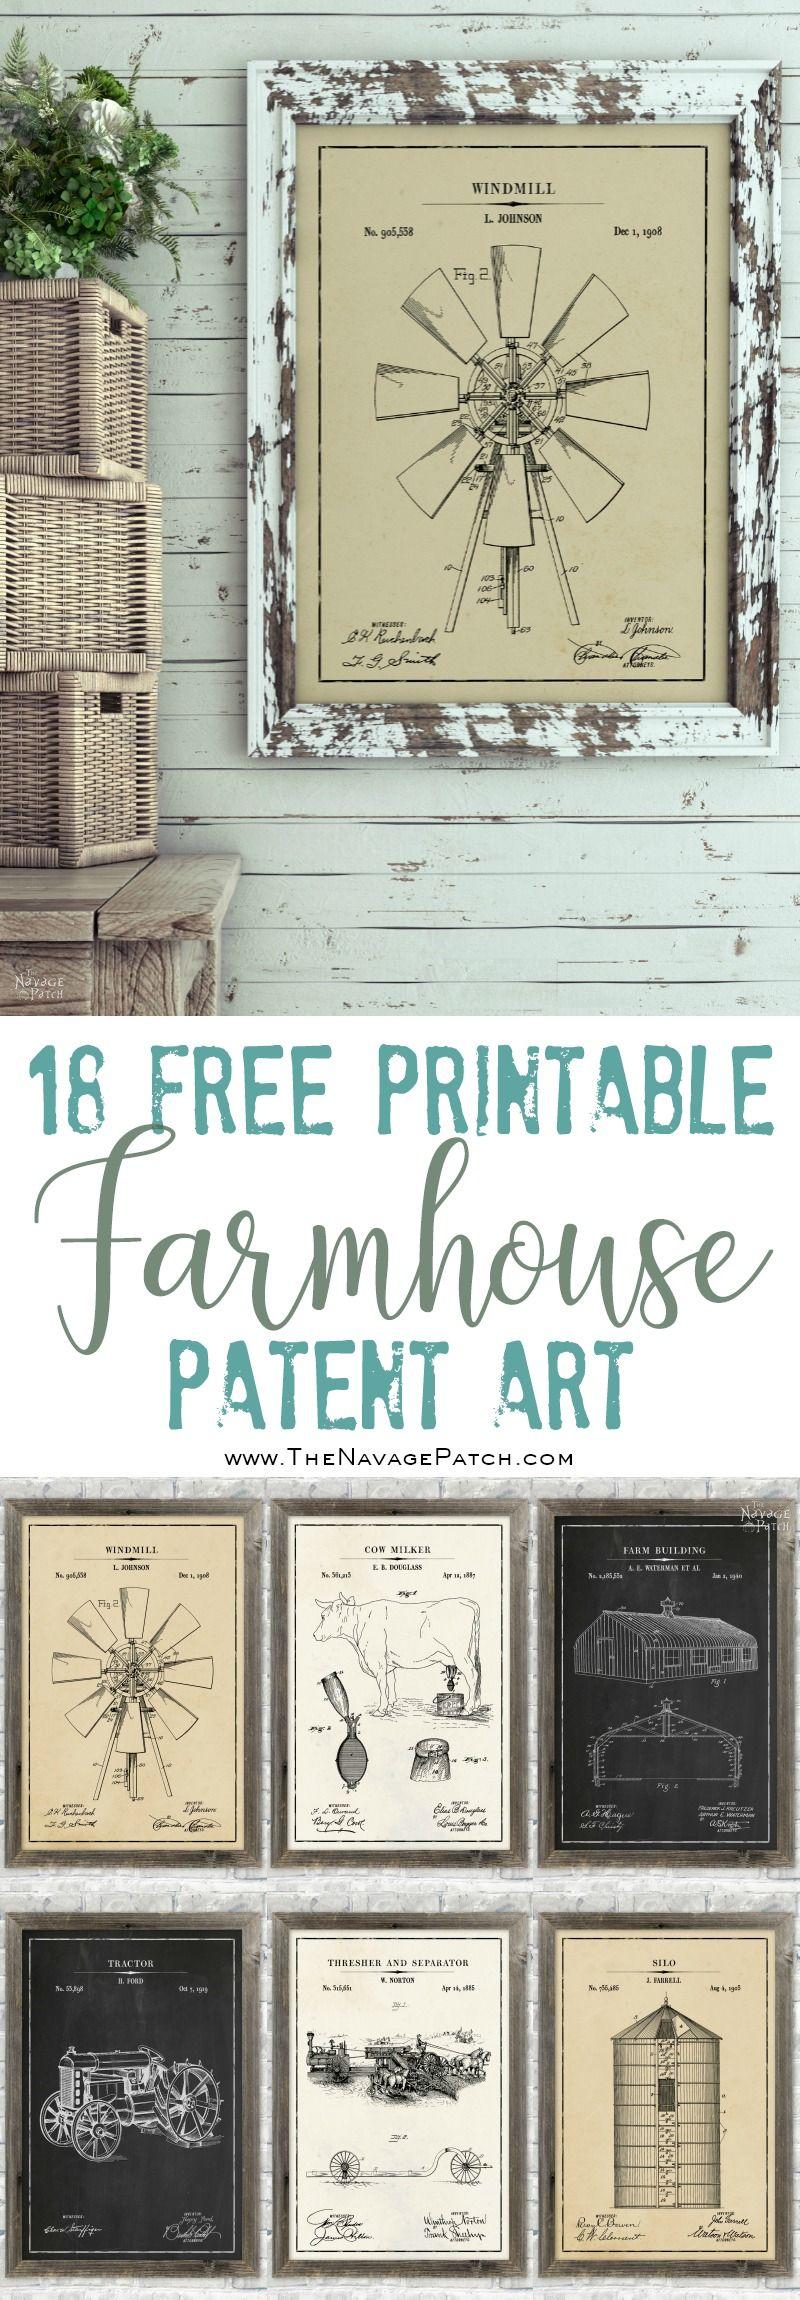 Farmhouse Patent Art (and Surprise Bonus Printables) pinterest image